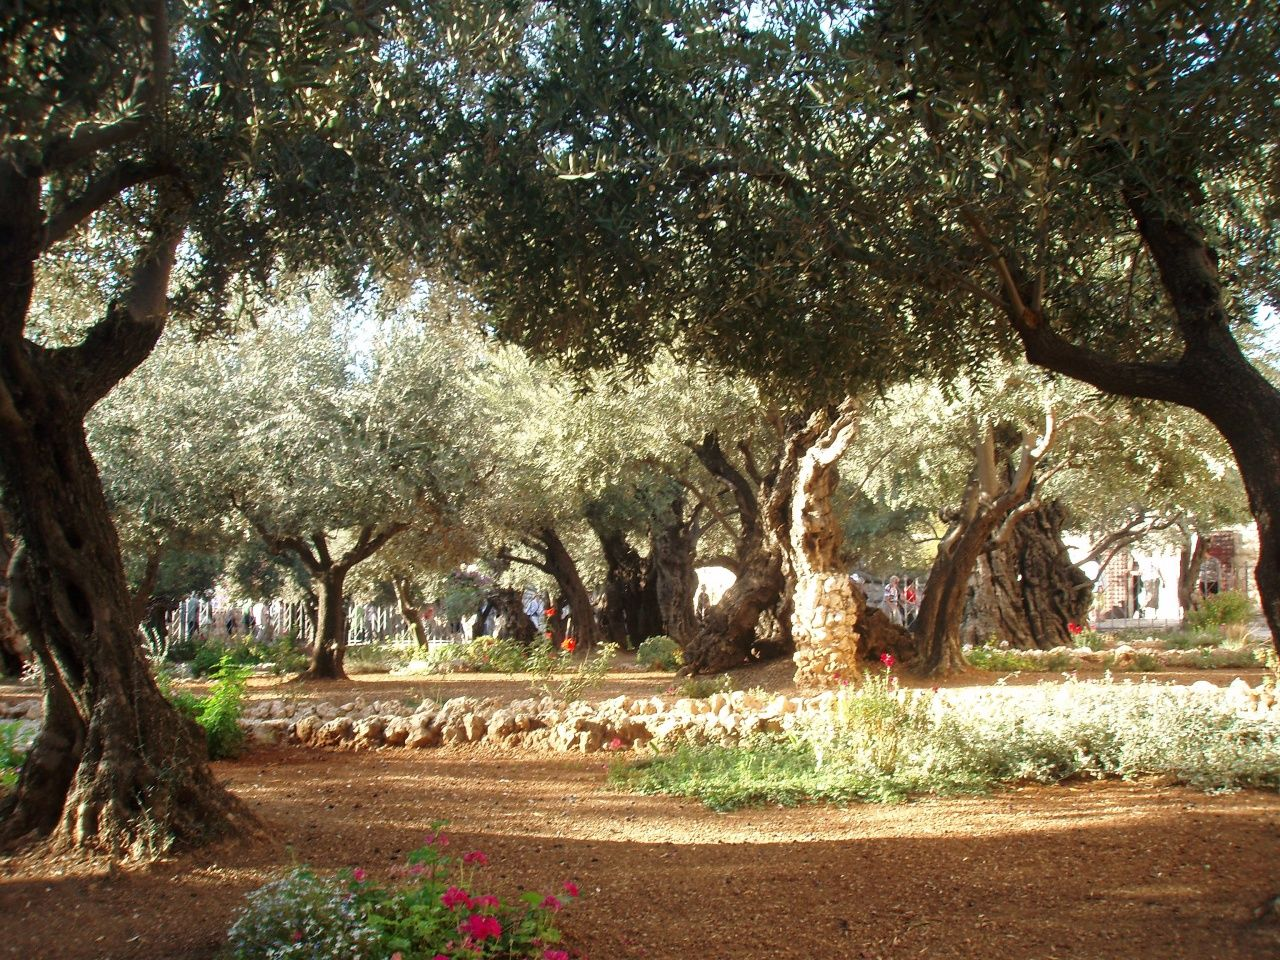 Garden of Gethsemane, Jerusalem | All things HOLY! | Pinterest ...